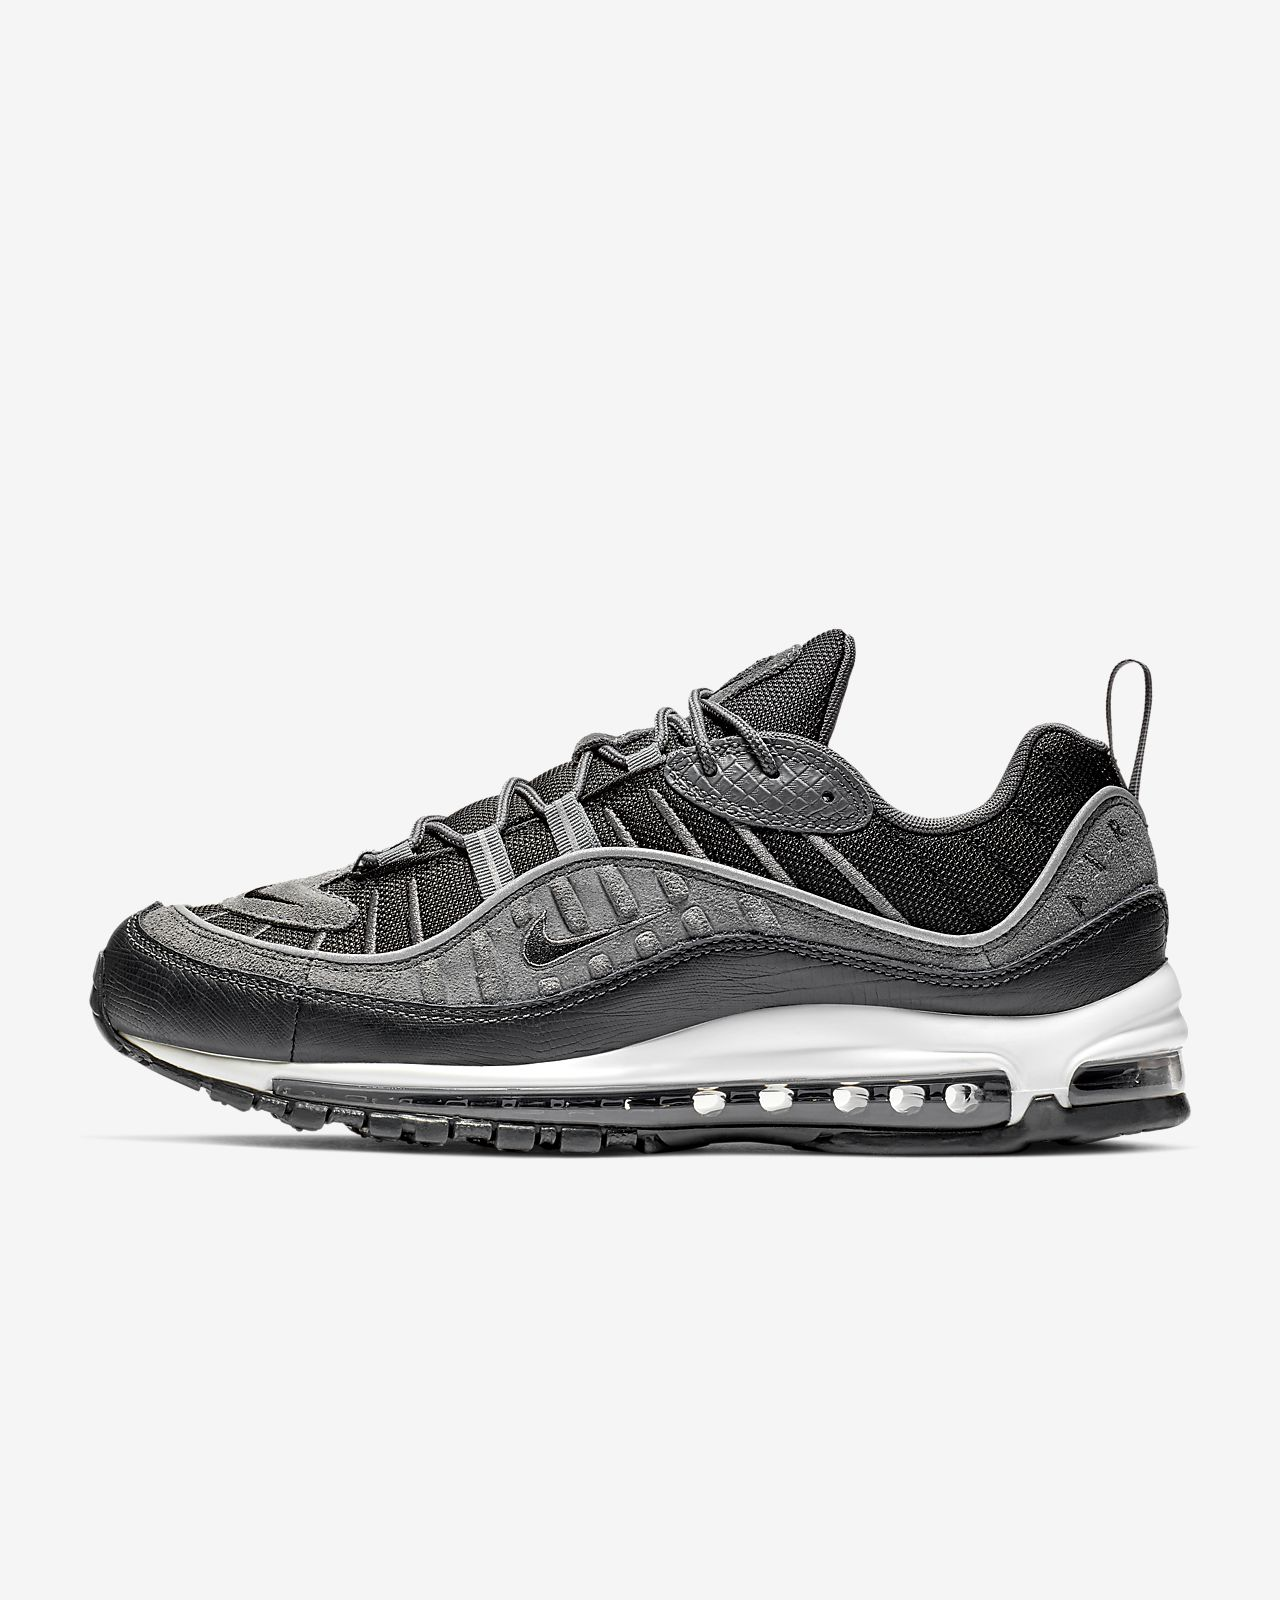 760df92328a ... coupon code nike air max 98 se sko til mænd dcfc1 2d950 where to buy nike  air max 90 dame black ...